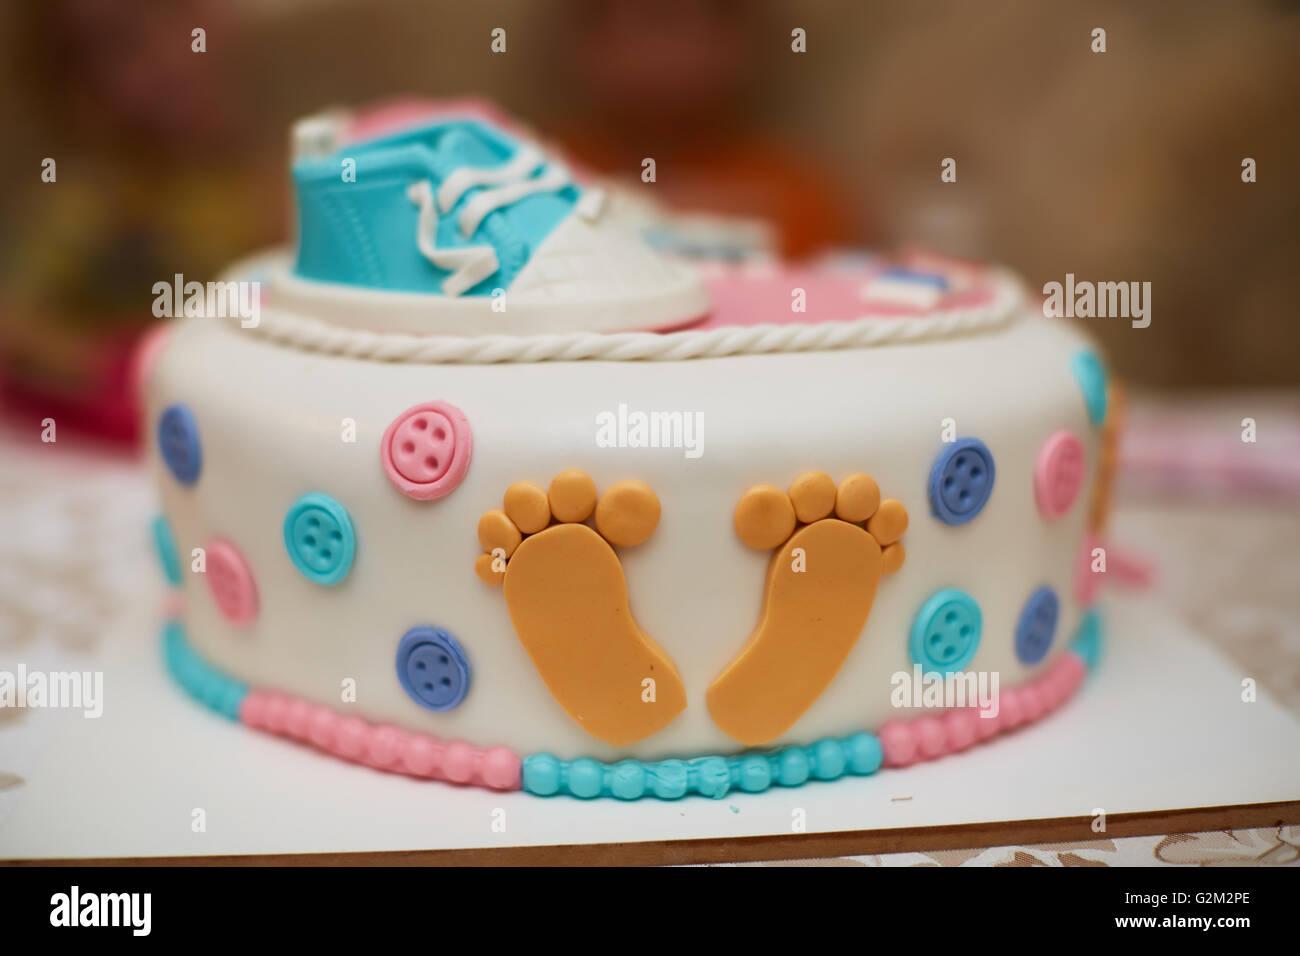 Delicious Birthday Cake On Table Stock Photo 104932758 Alamy